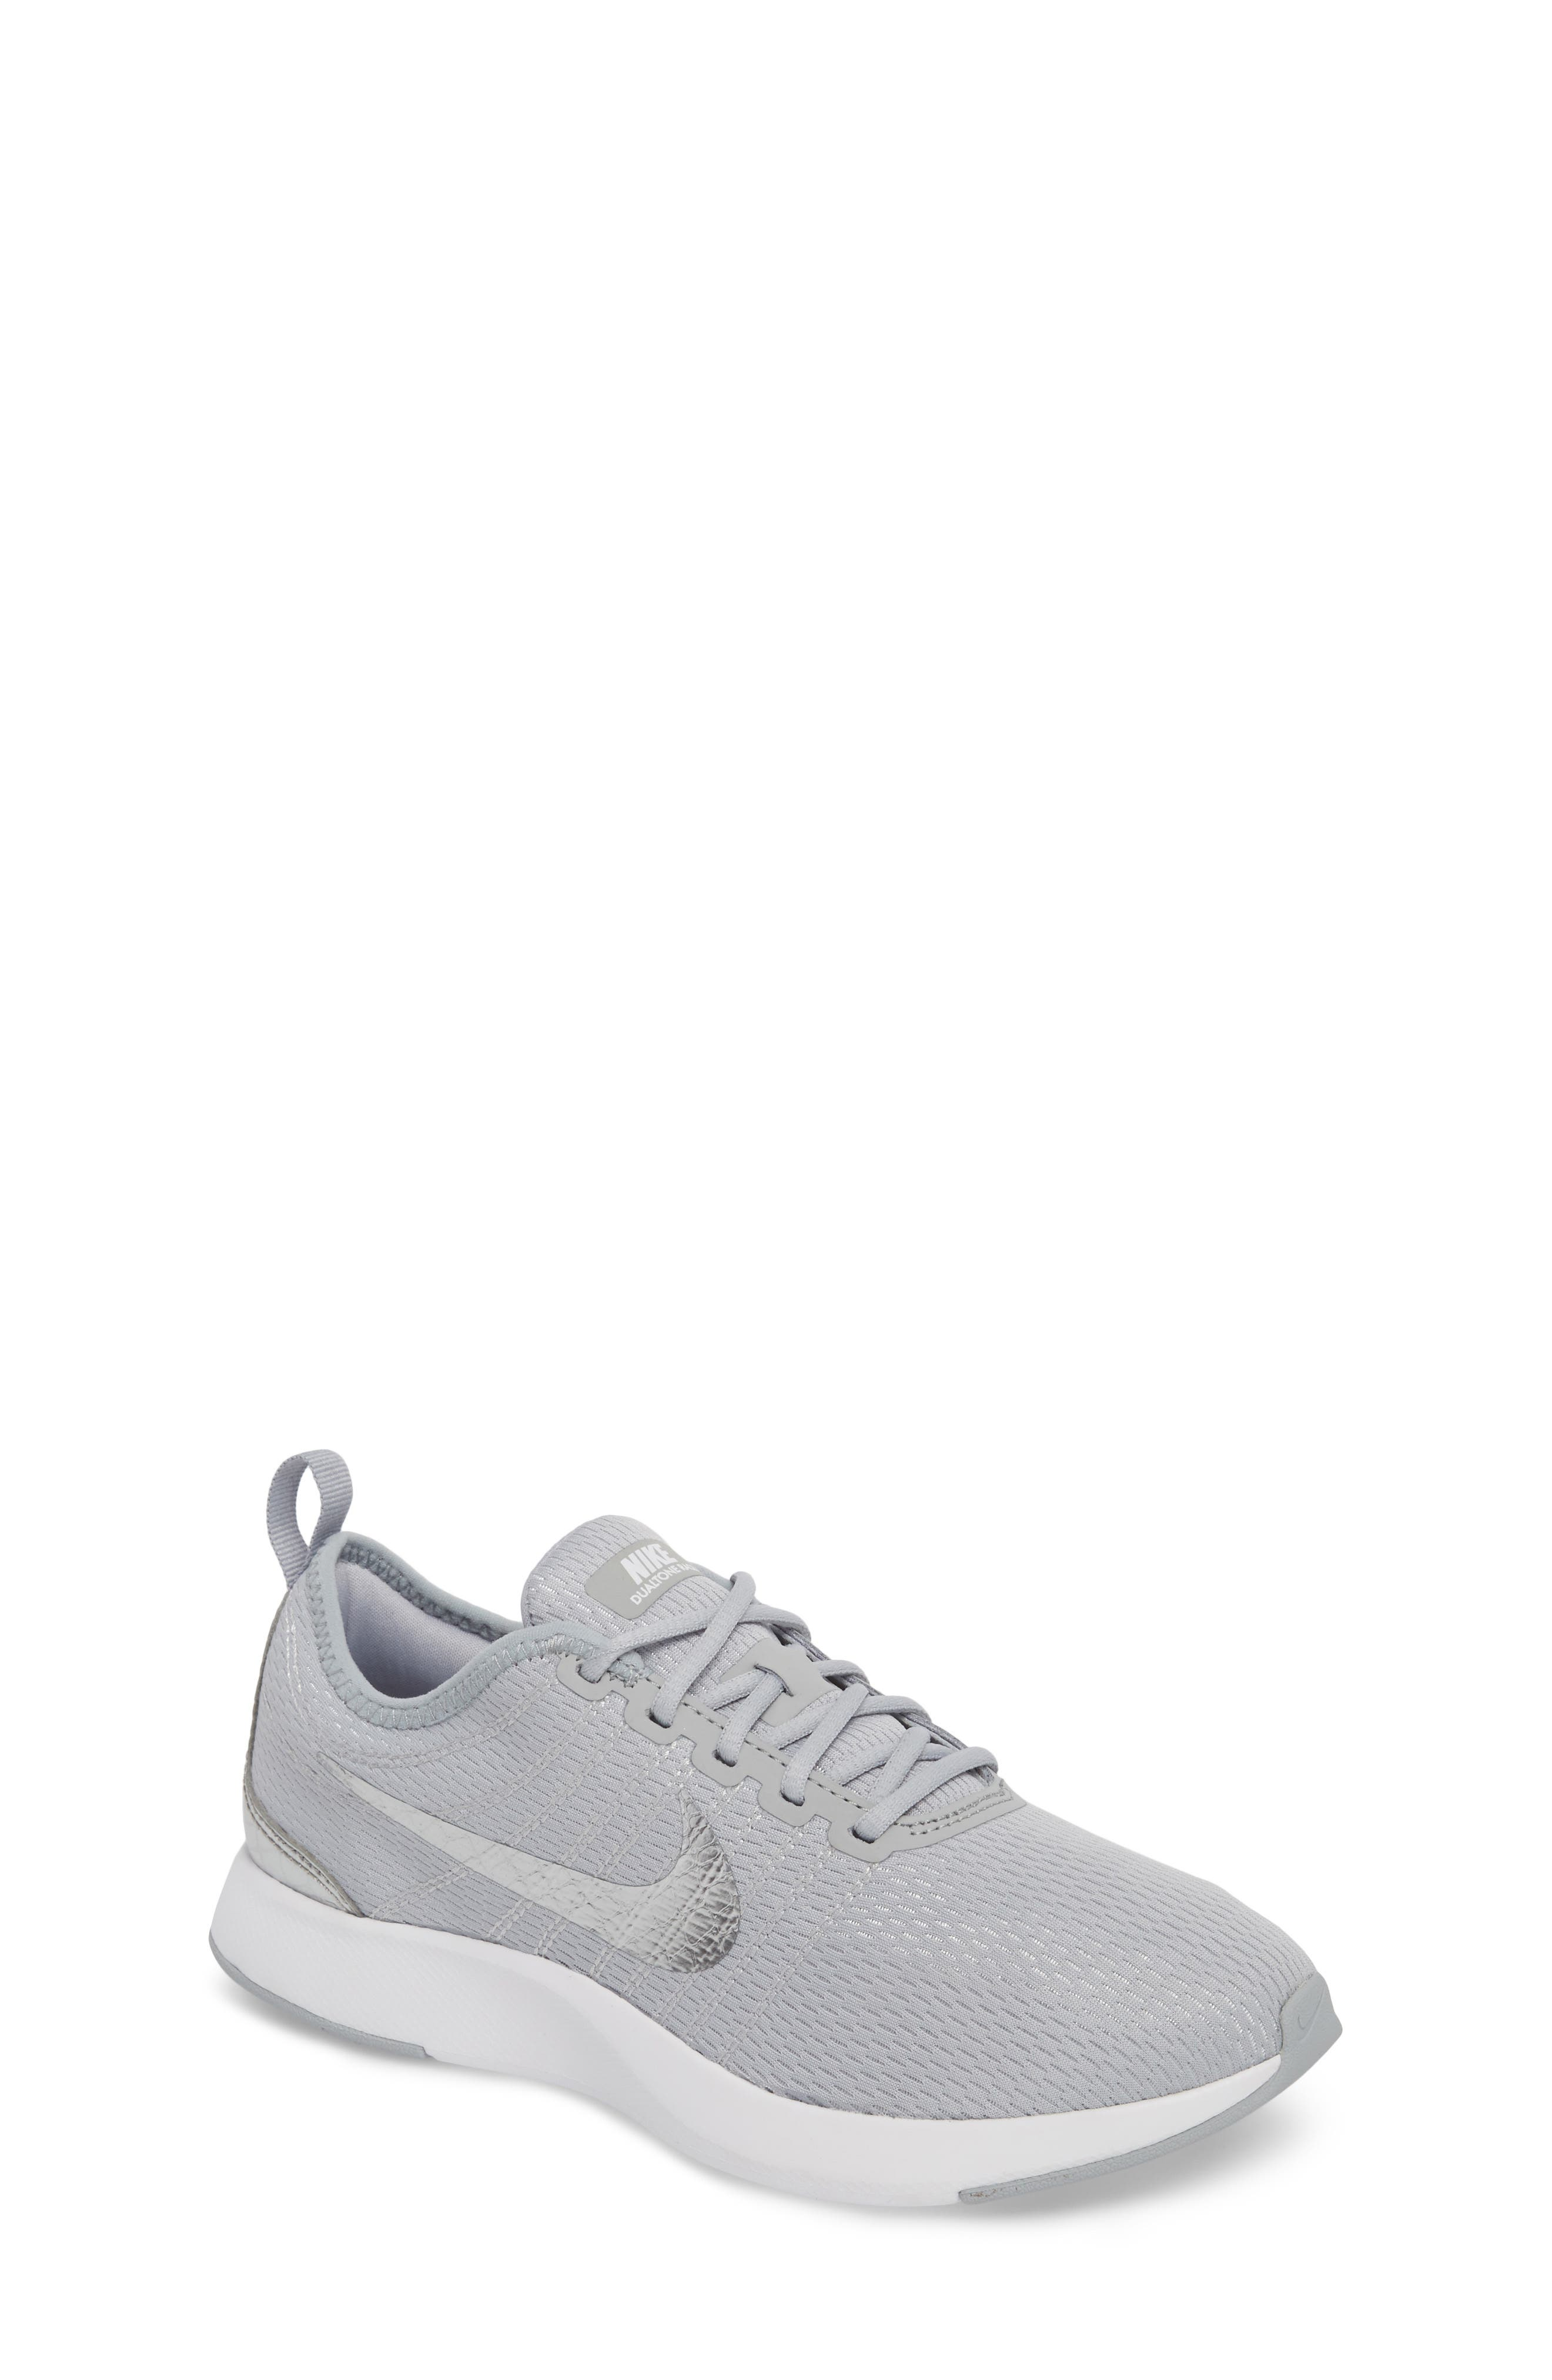 Dualtone Racer GS Sneaker,                             Main thumbnail 1, color,                             Wolf Grey/ Metallic Silver